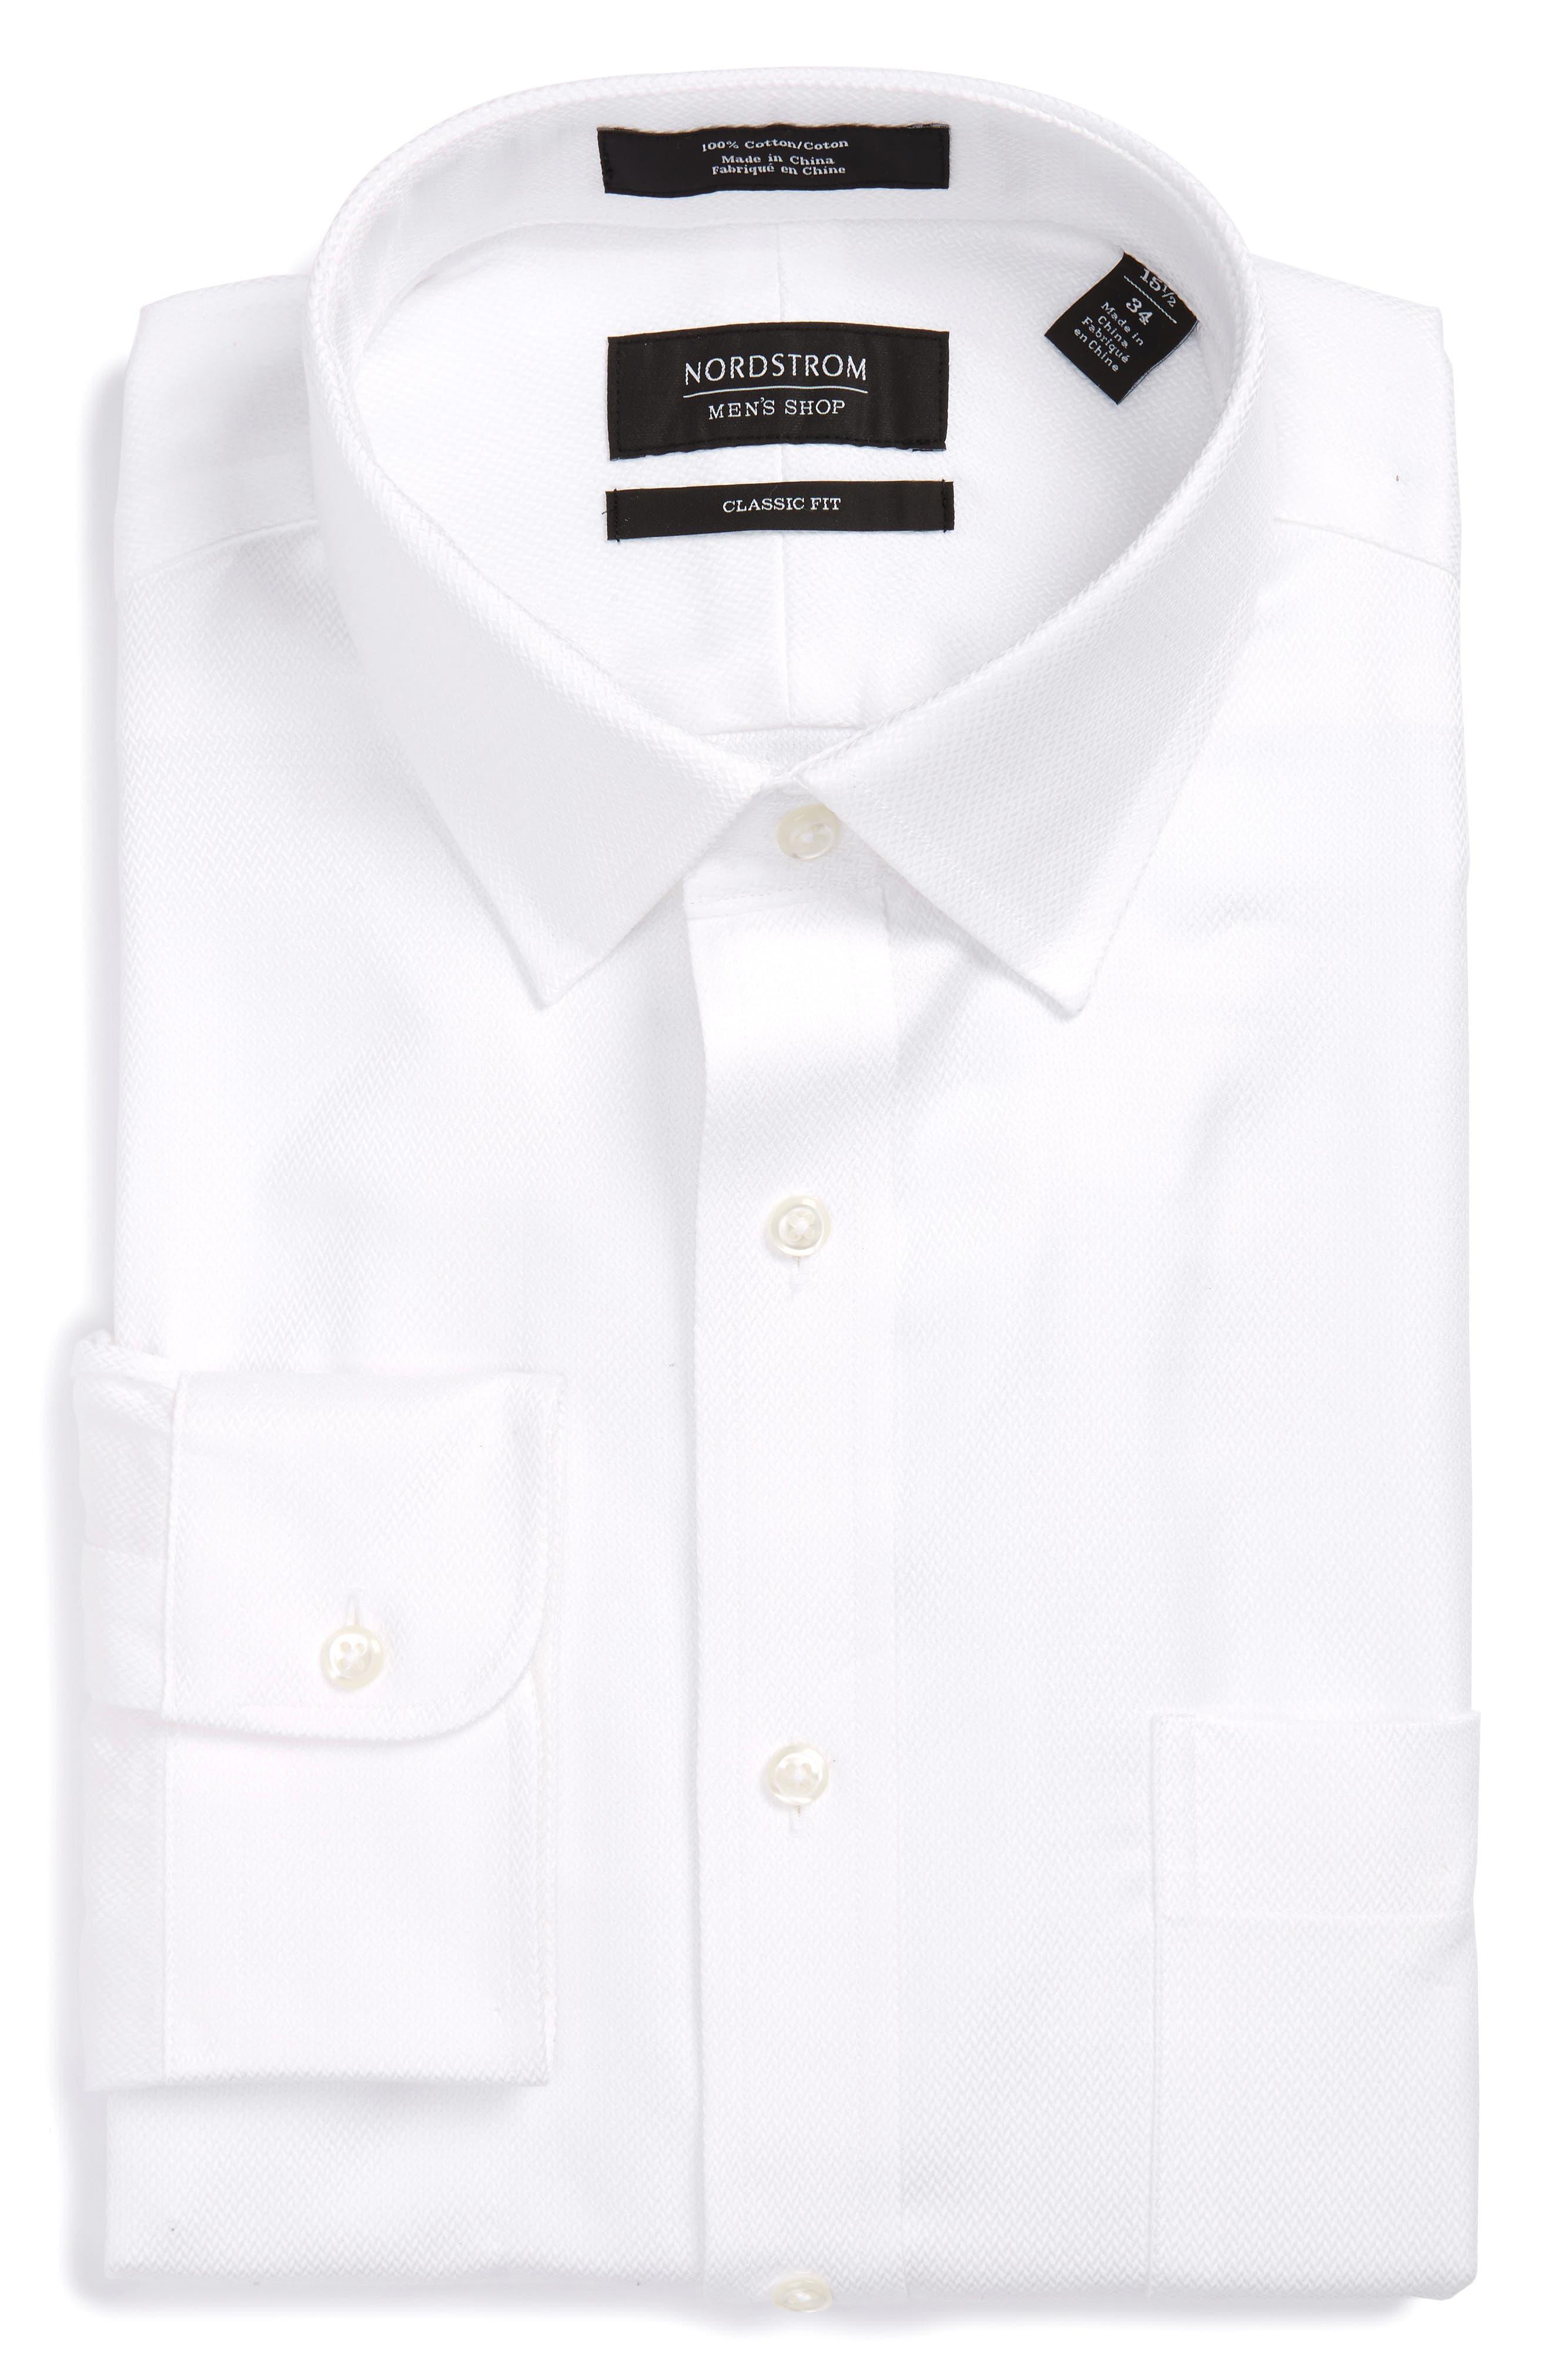 NORDSTROM MENS SHOP Classic Fit Textured Dress Shirt